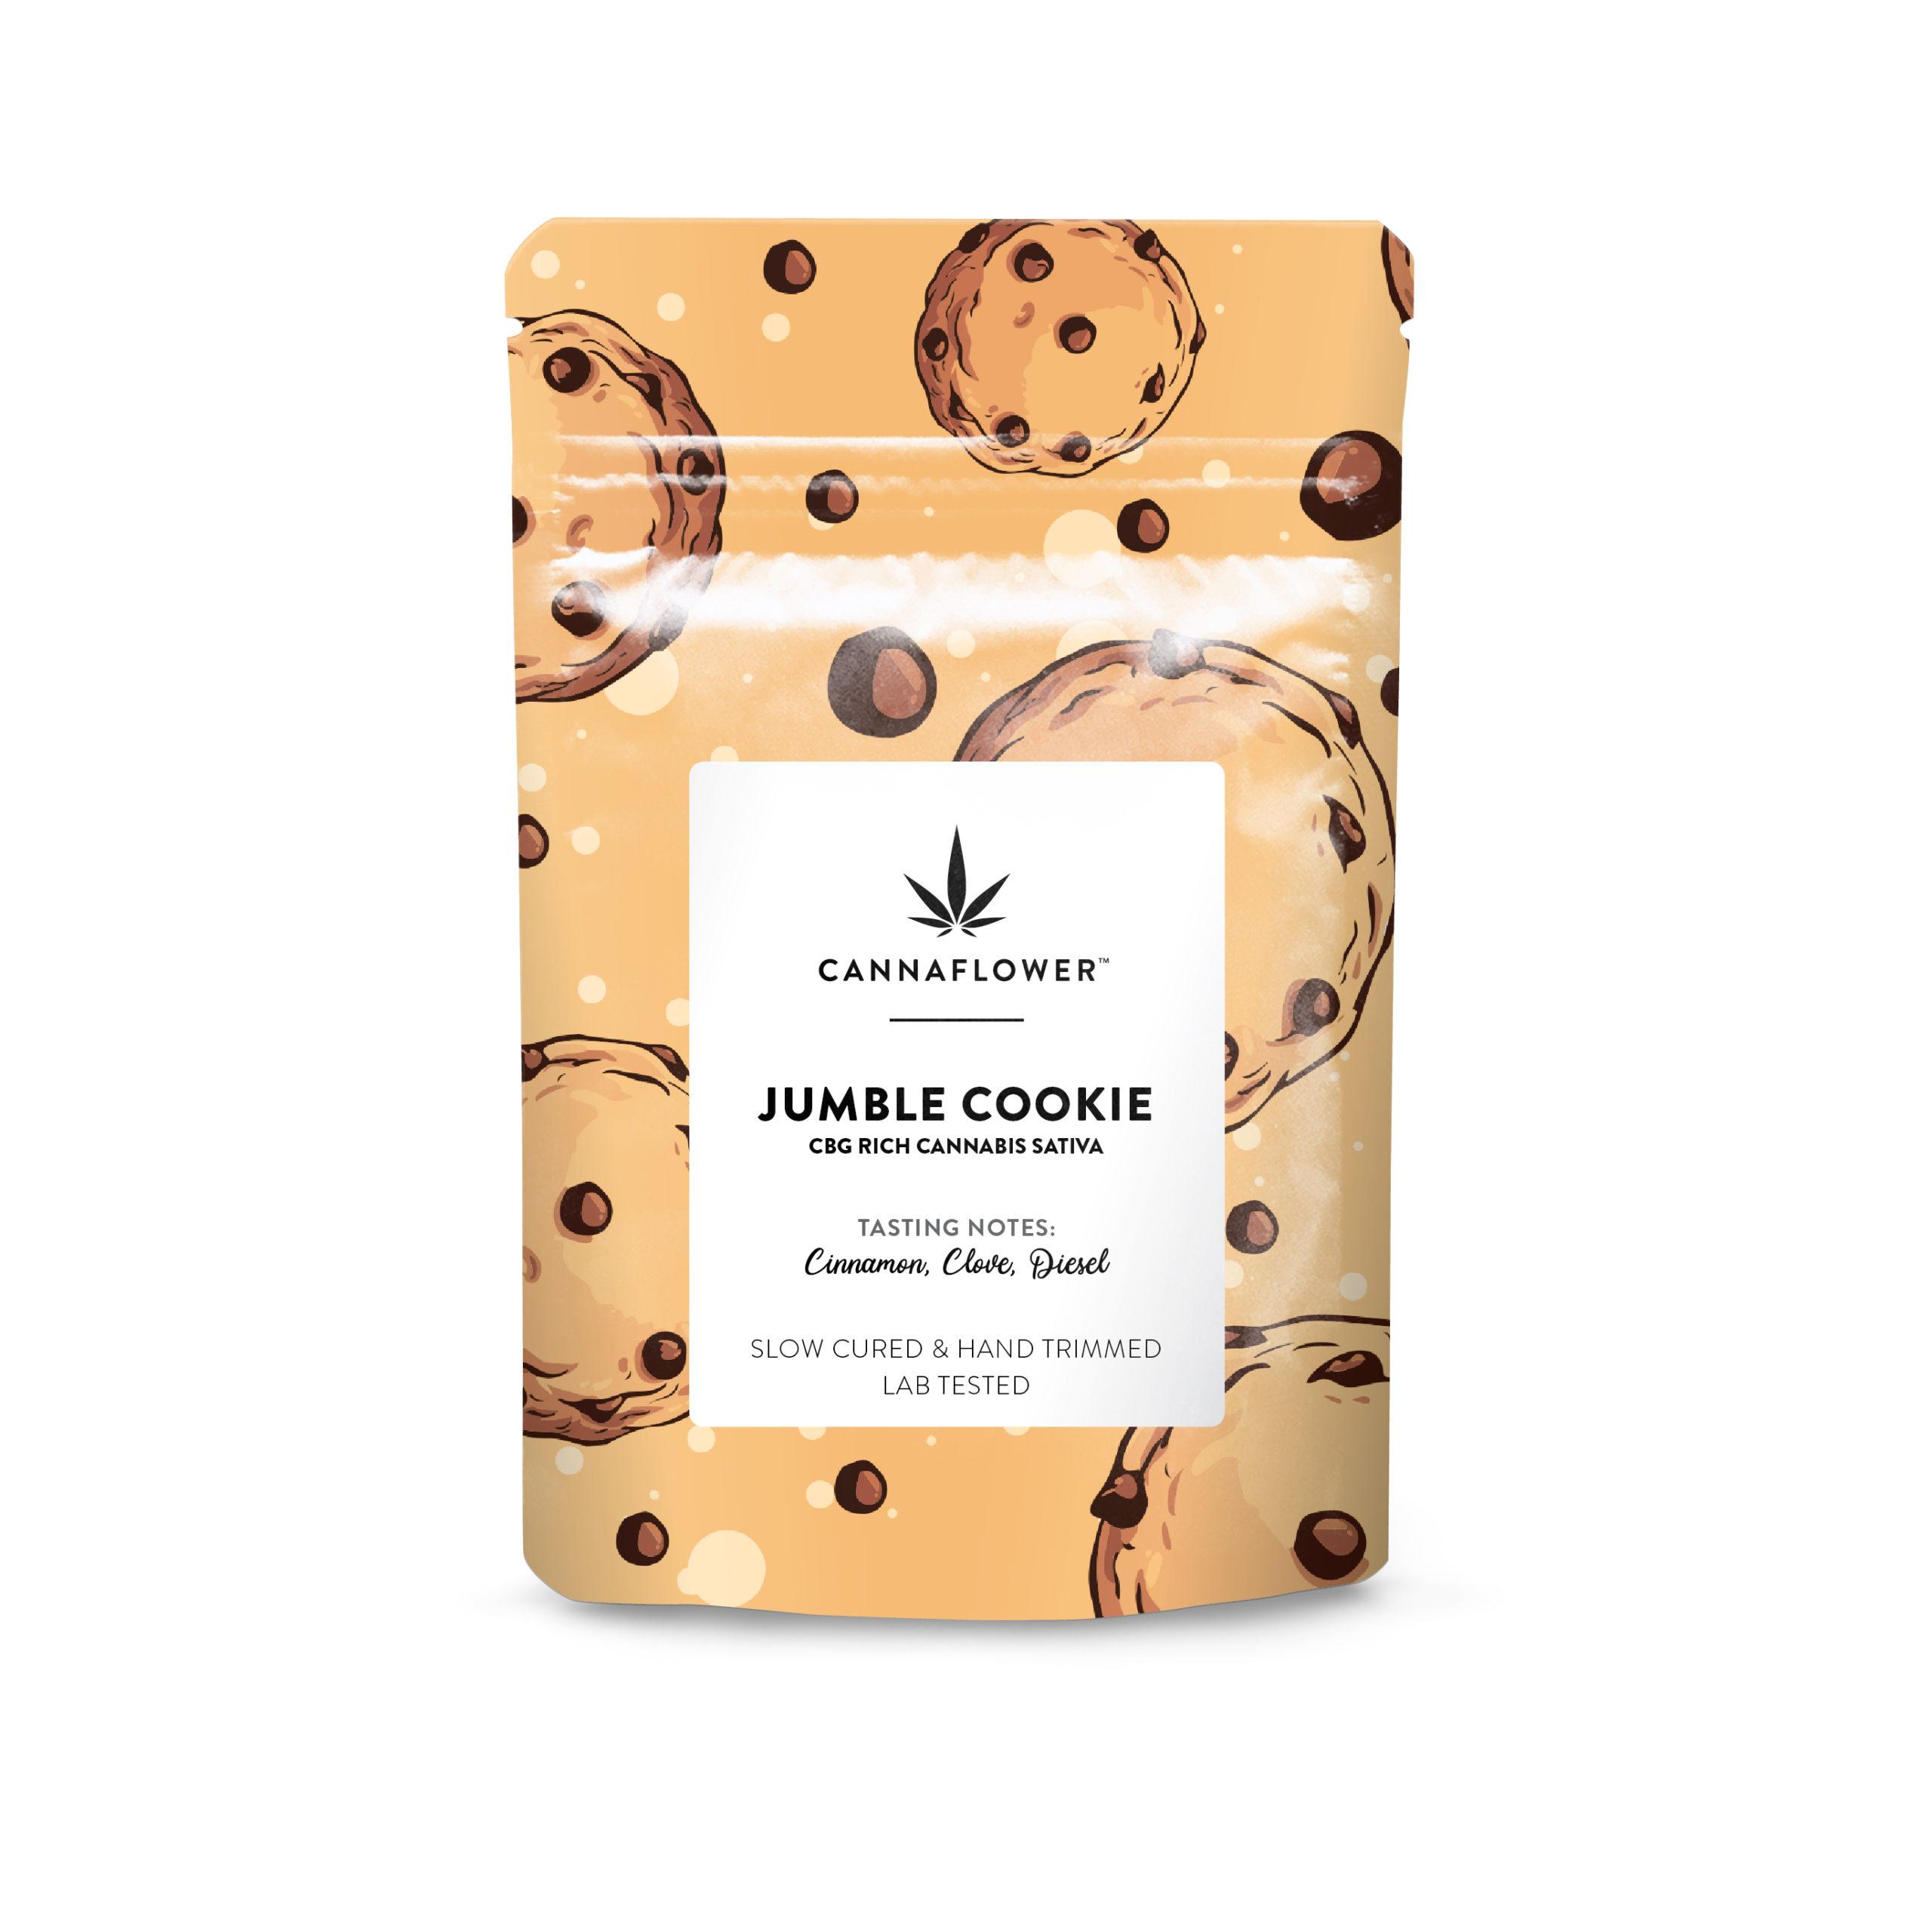 Cannaflower Jumble Cookie